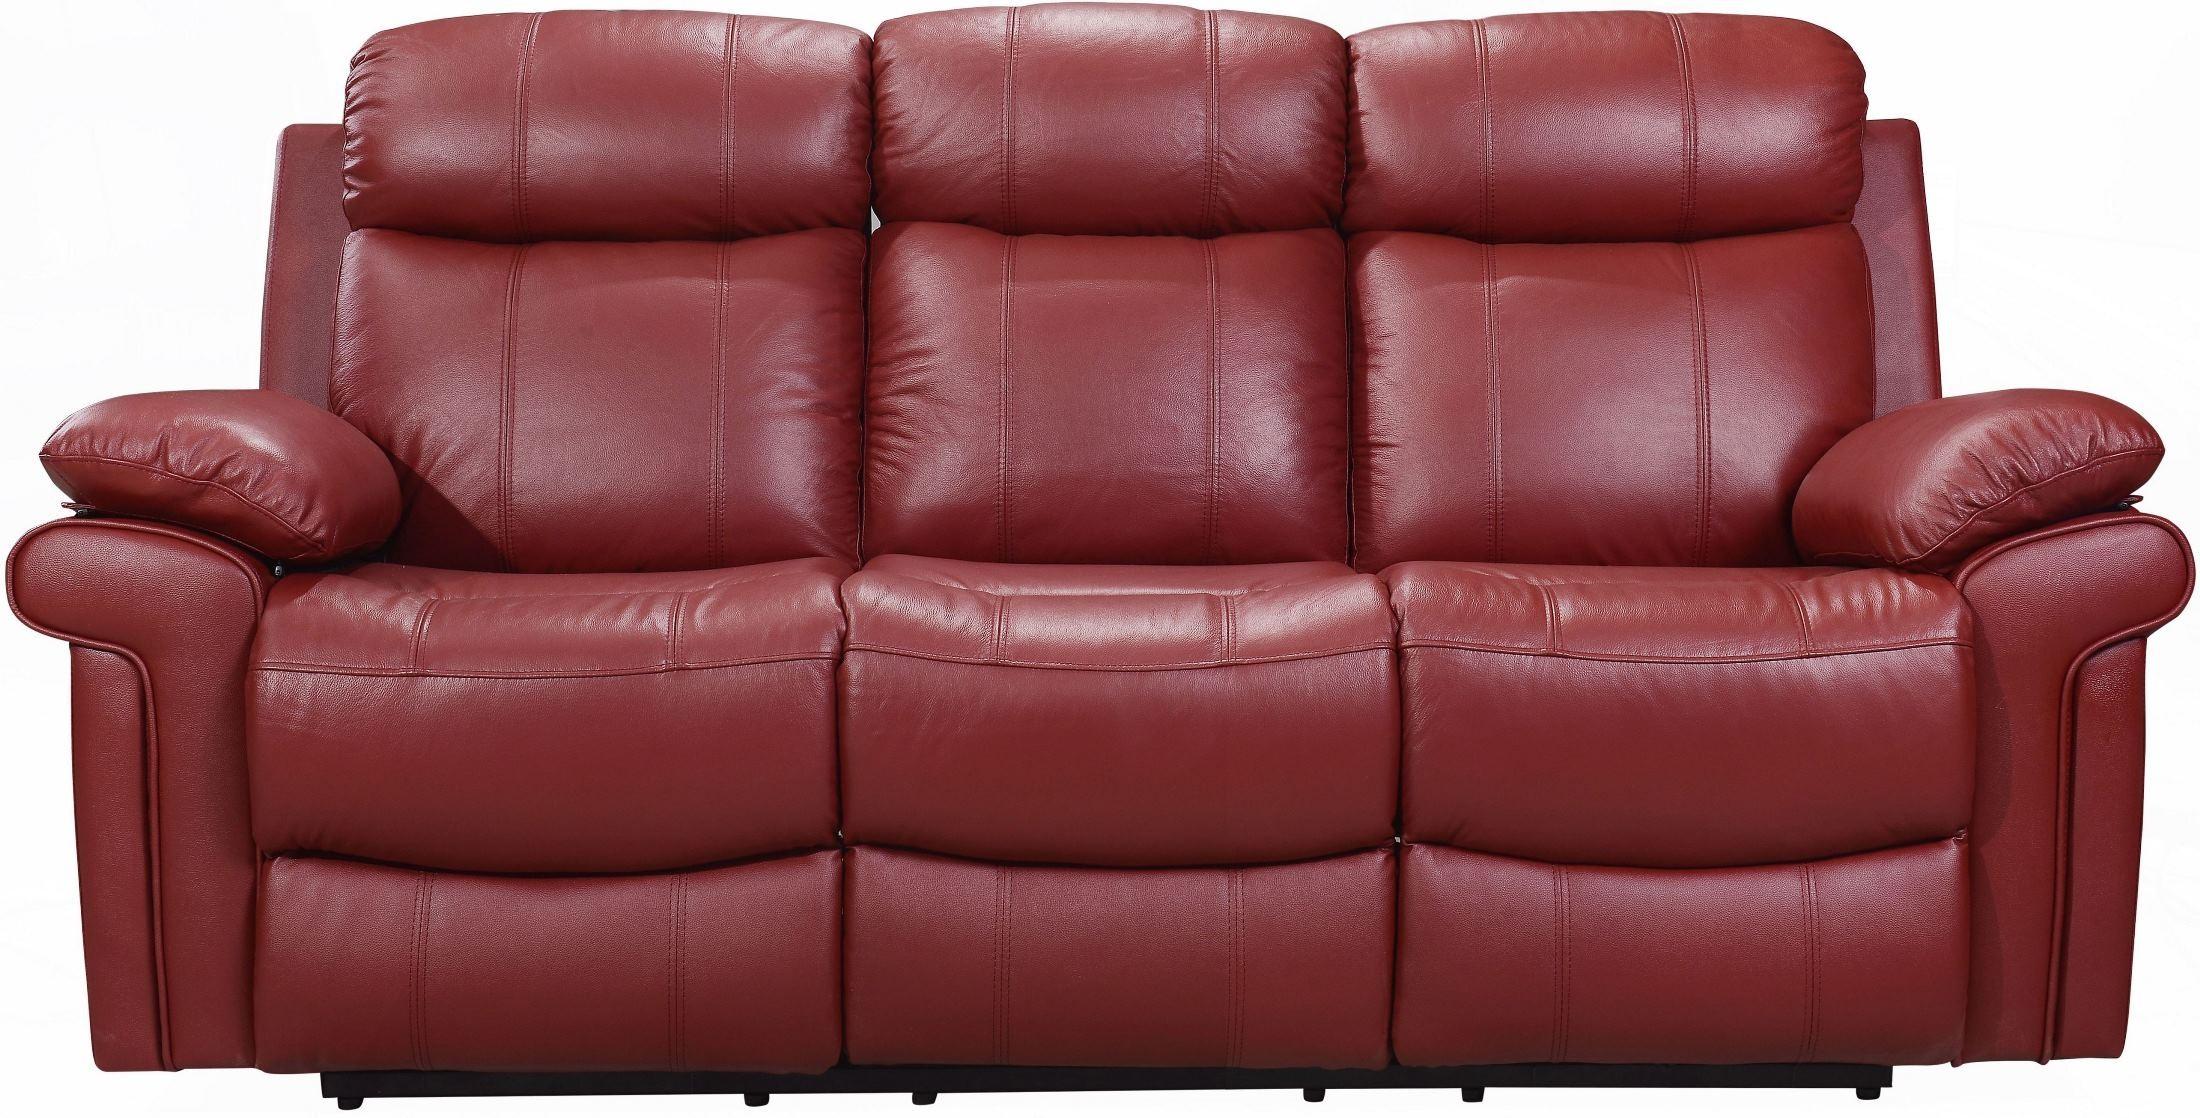 Shae Joplin Red Leather Power Reclining Living Room Set ...